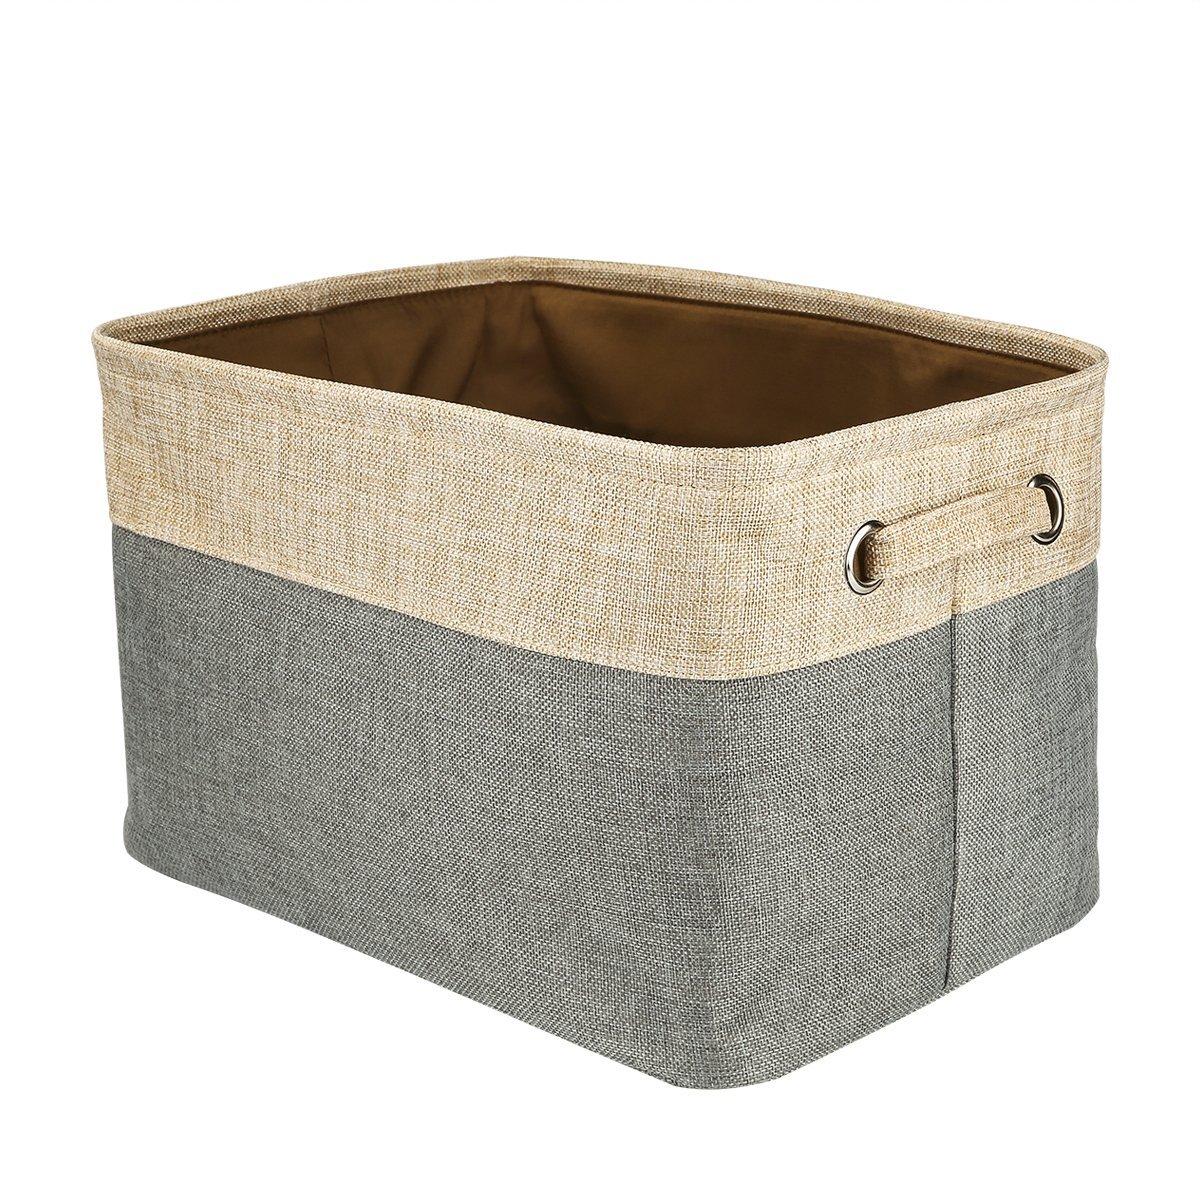 Foldable Convenient Storage Box Organizing Basket Closet Organizer with Handles, Cotton & Jute